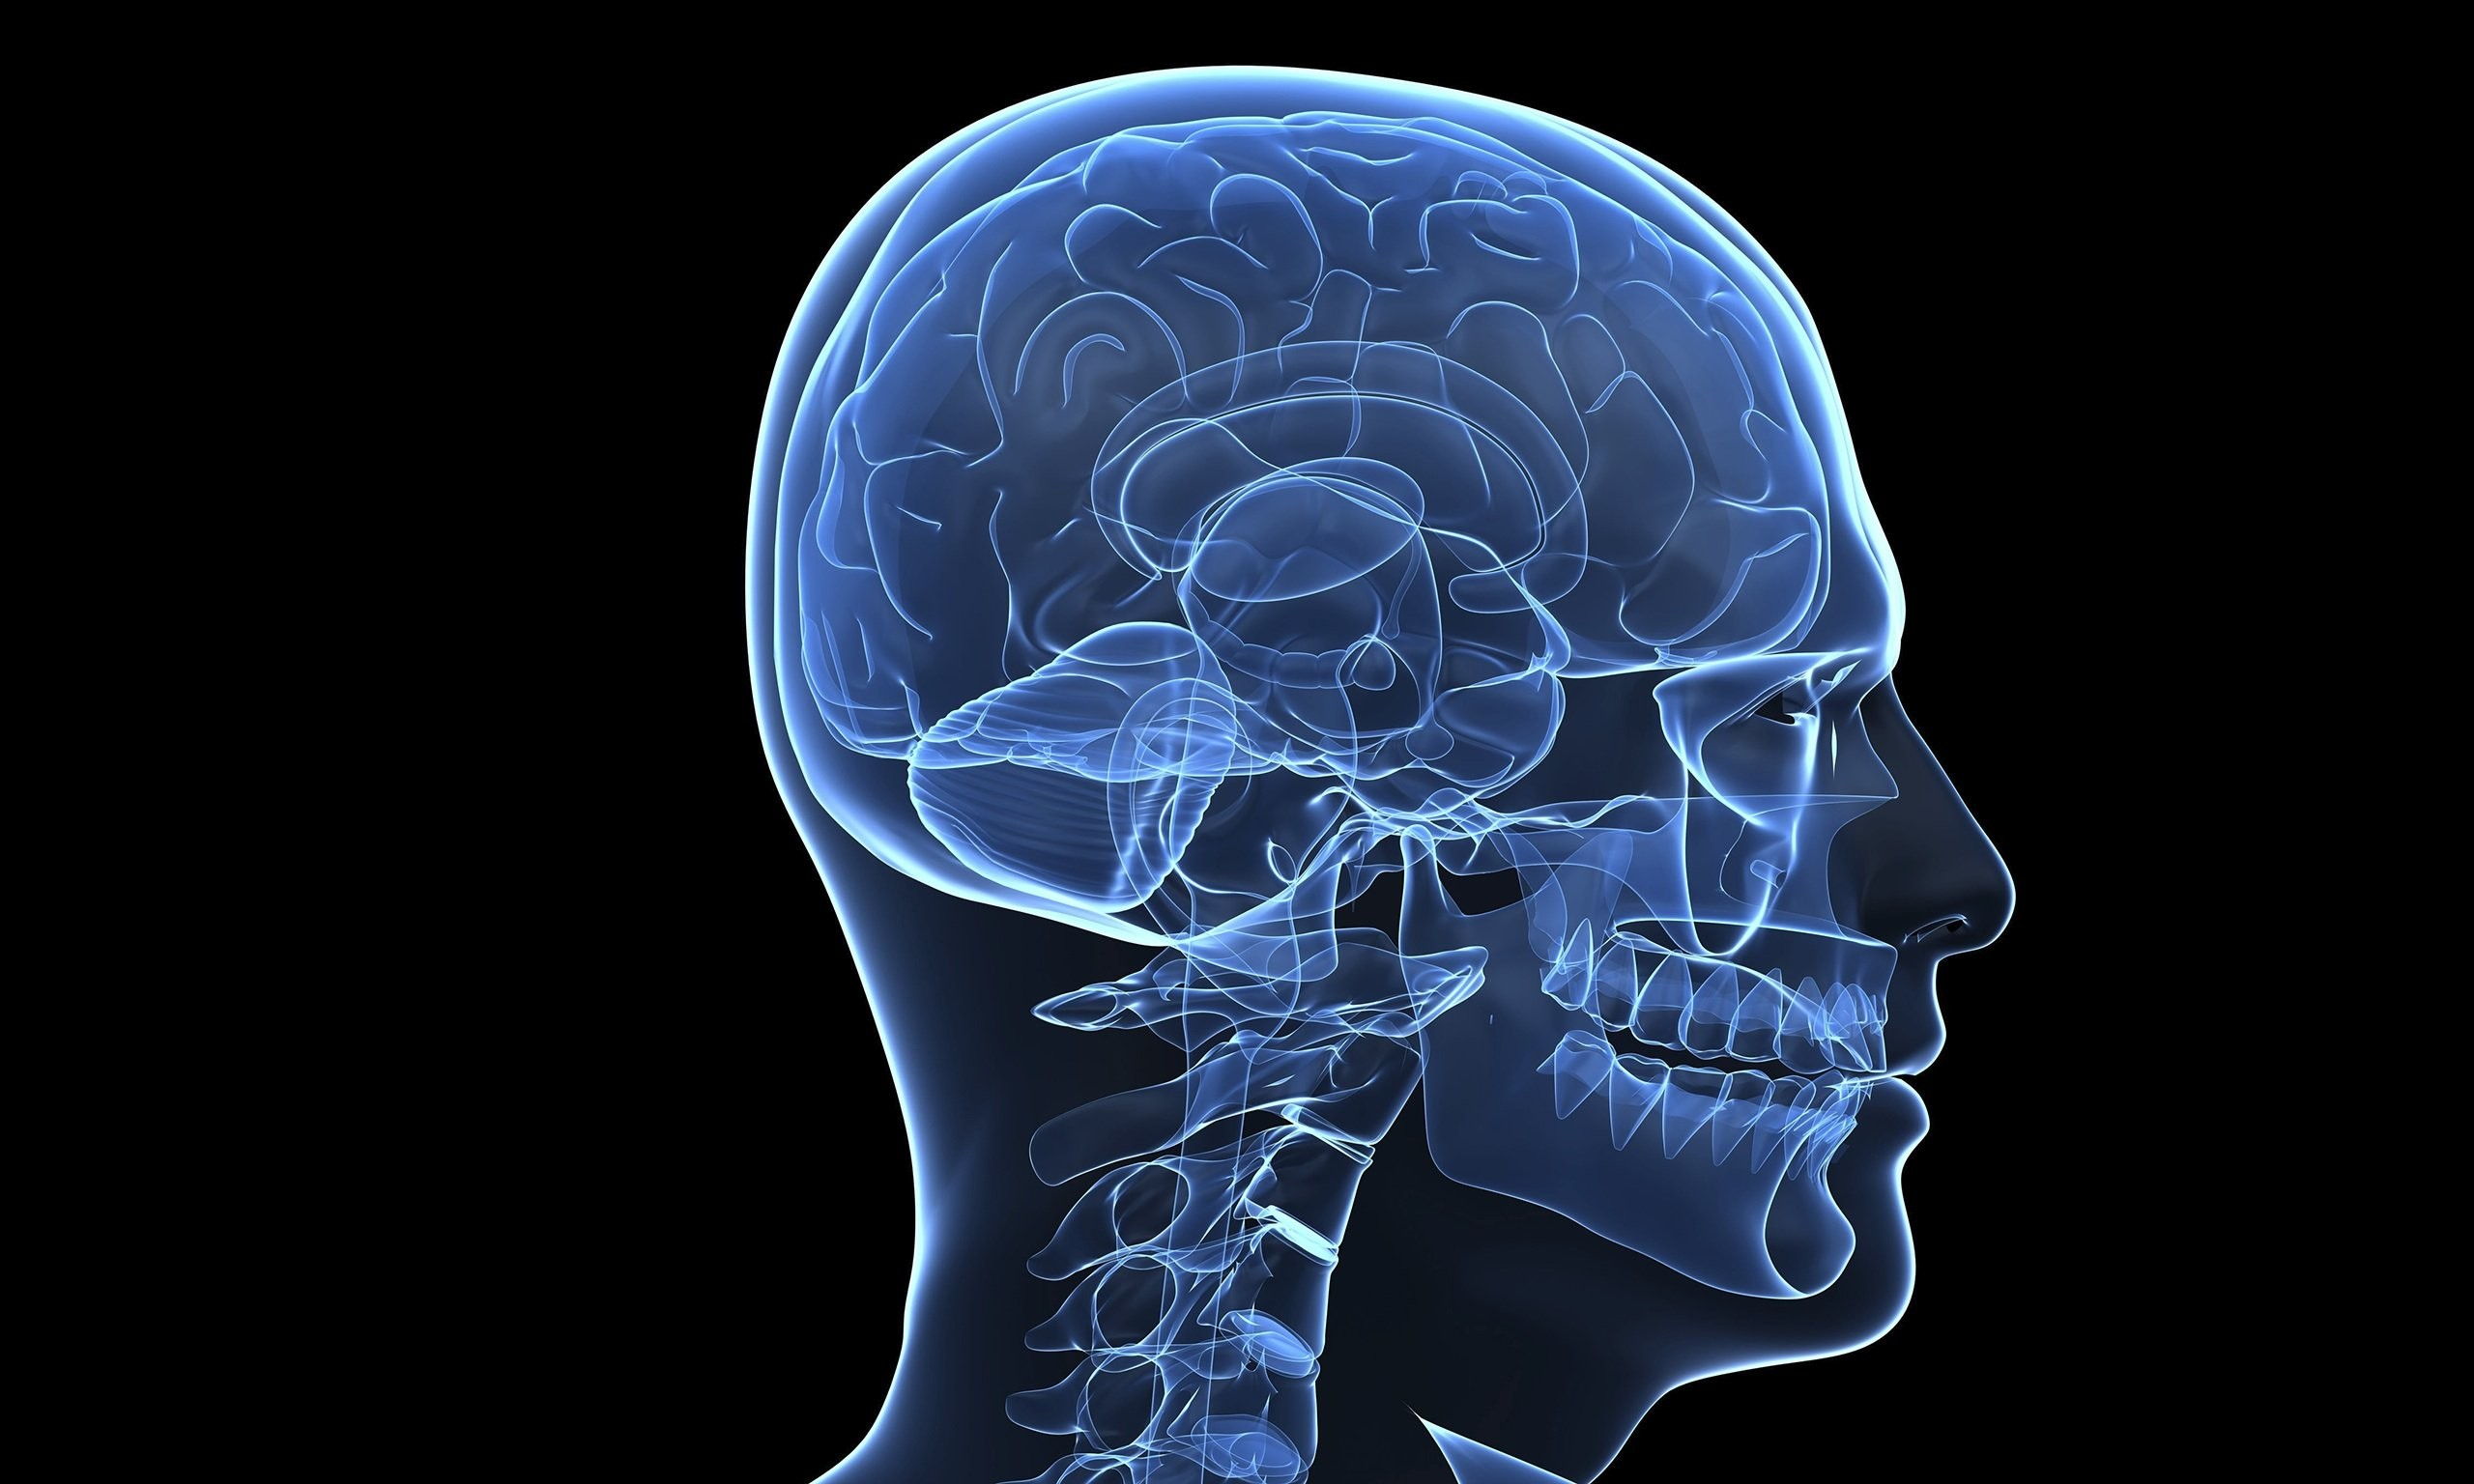 Brain Anatomy Medical Head Skull Digital 3d Xray Psychedelic Wallpaper At  3d Wallpapers